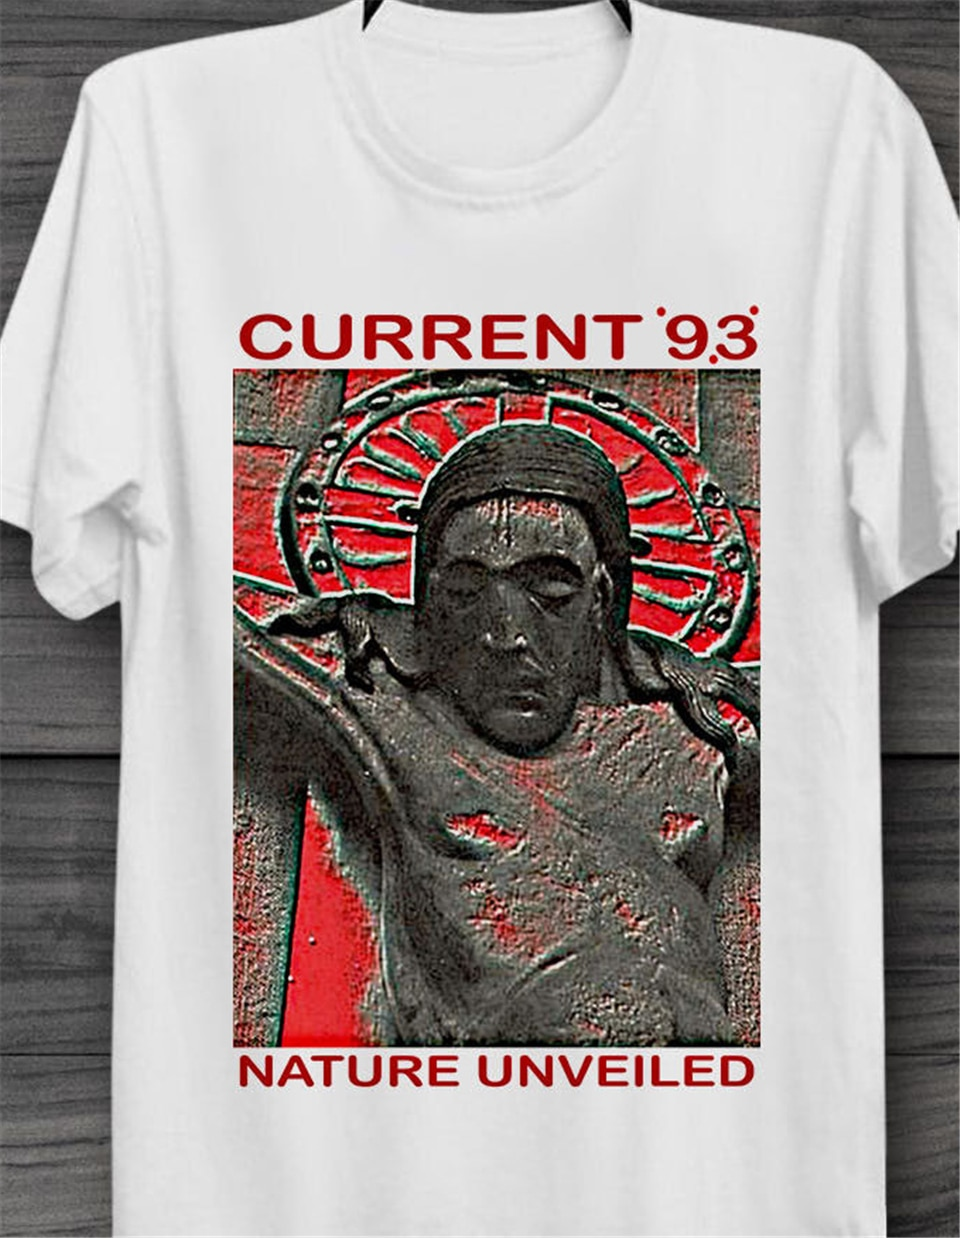 Camiseta retro con estampado de naturaleza, Versión actual 93, música fresca, Unisex, B341